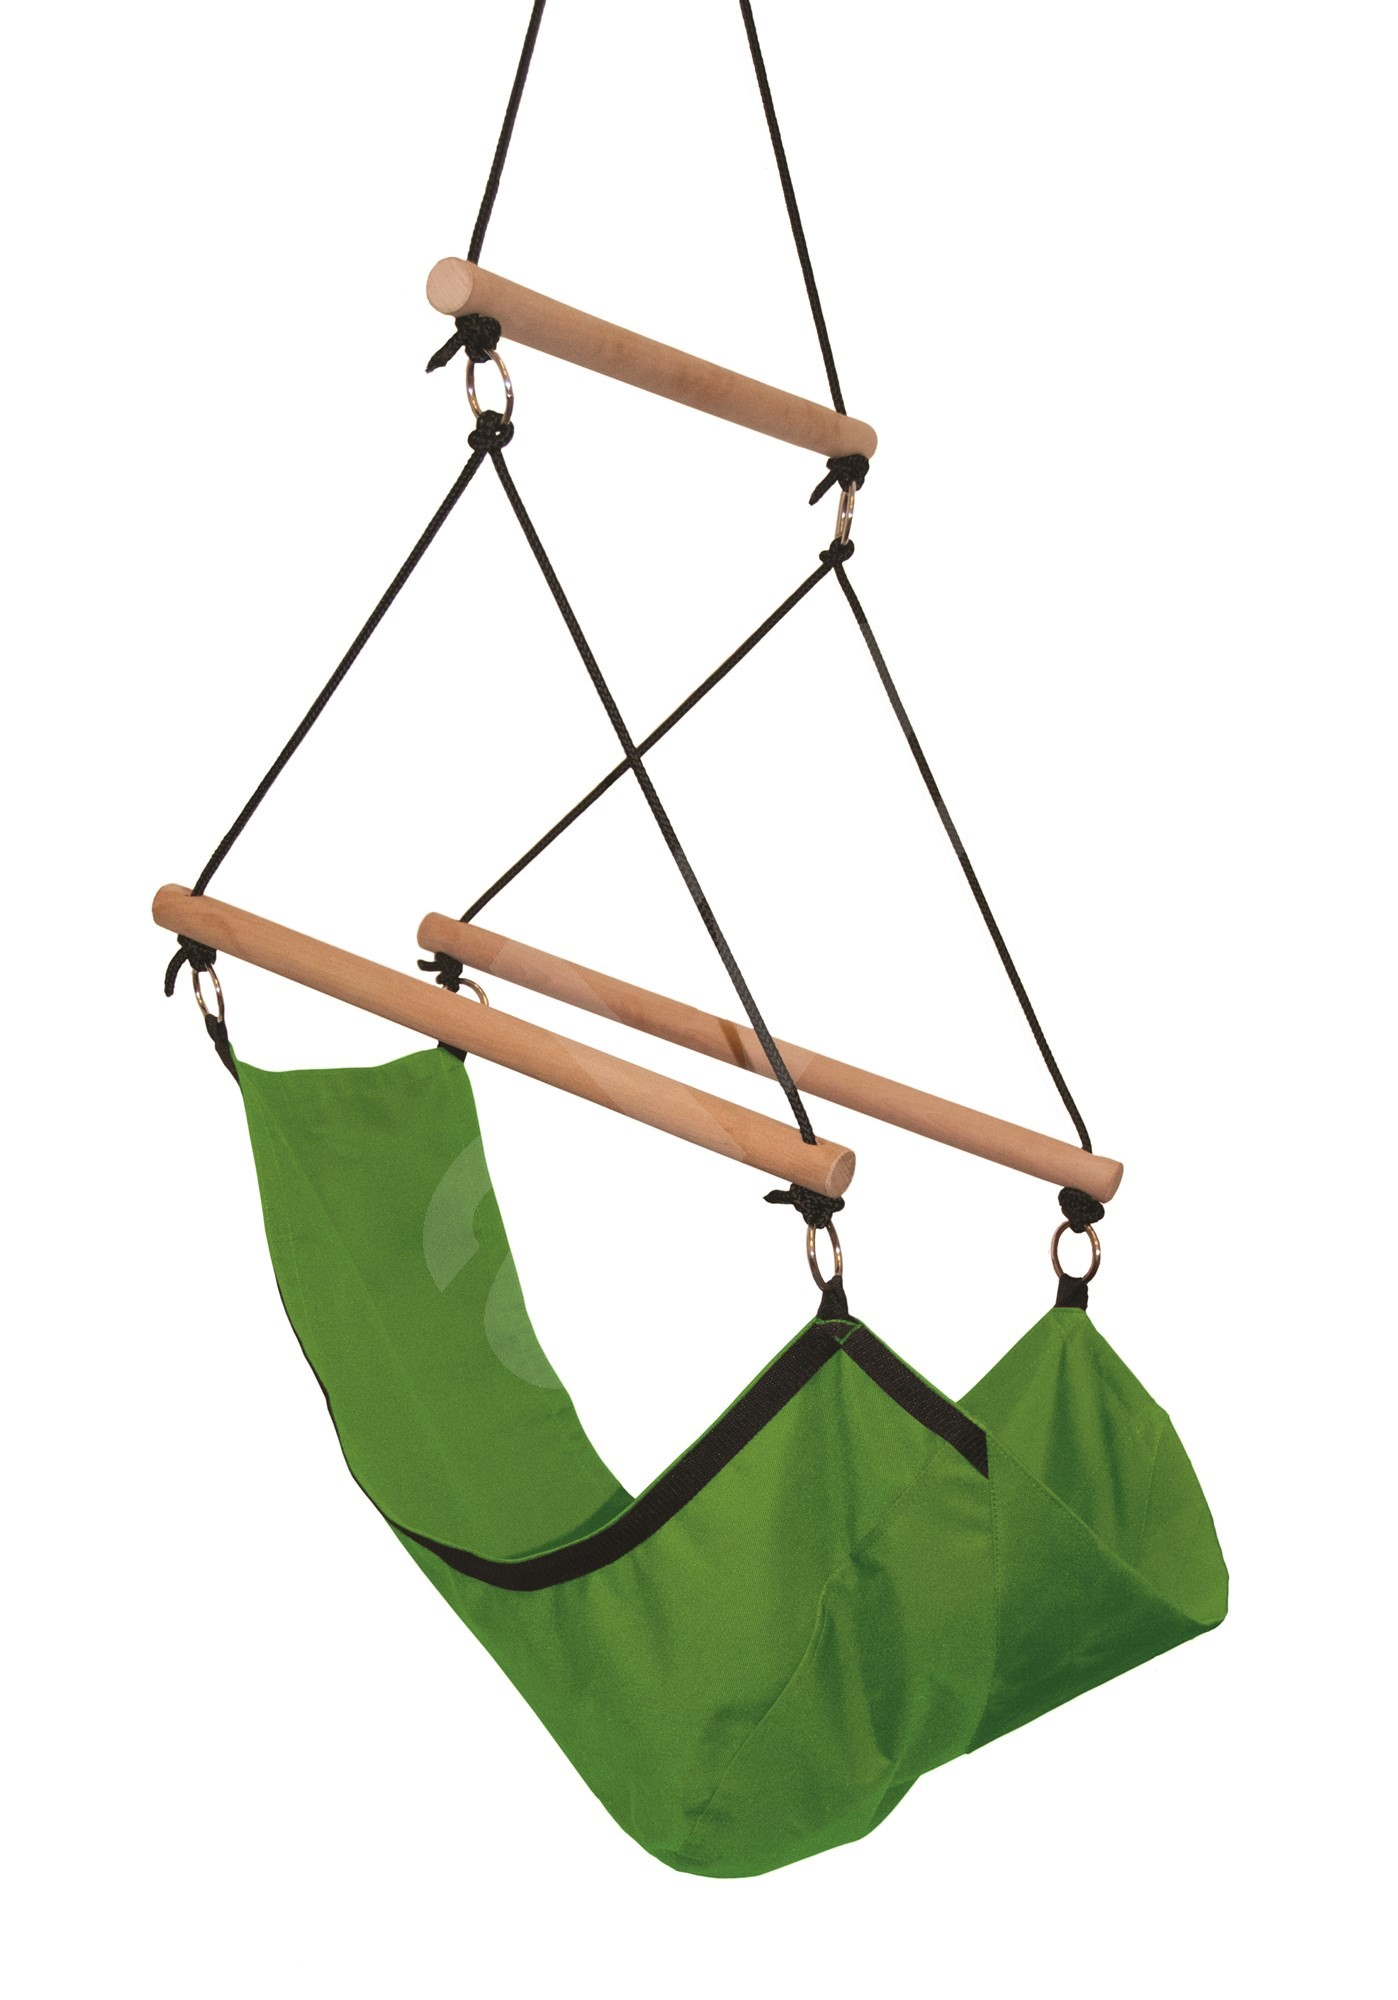 Rocking chair fabric - green